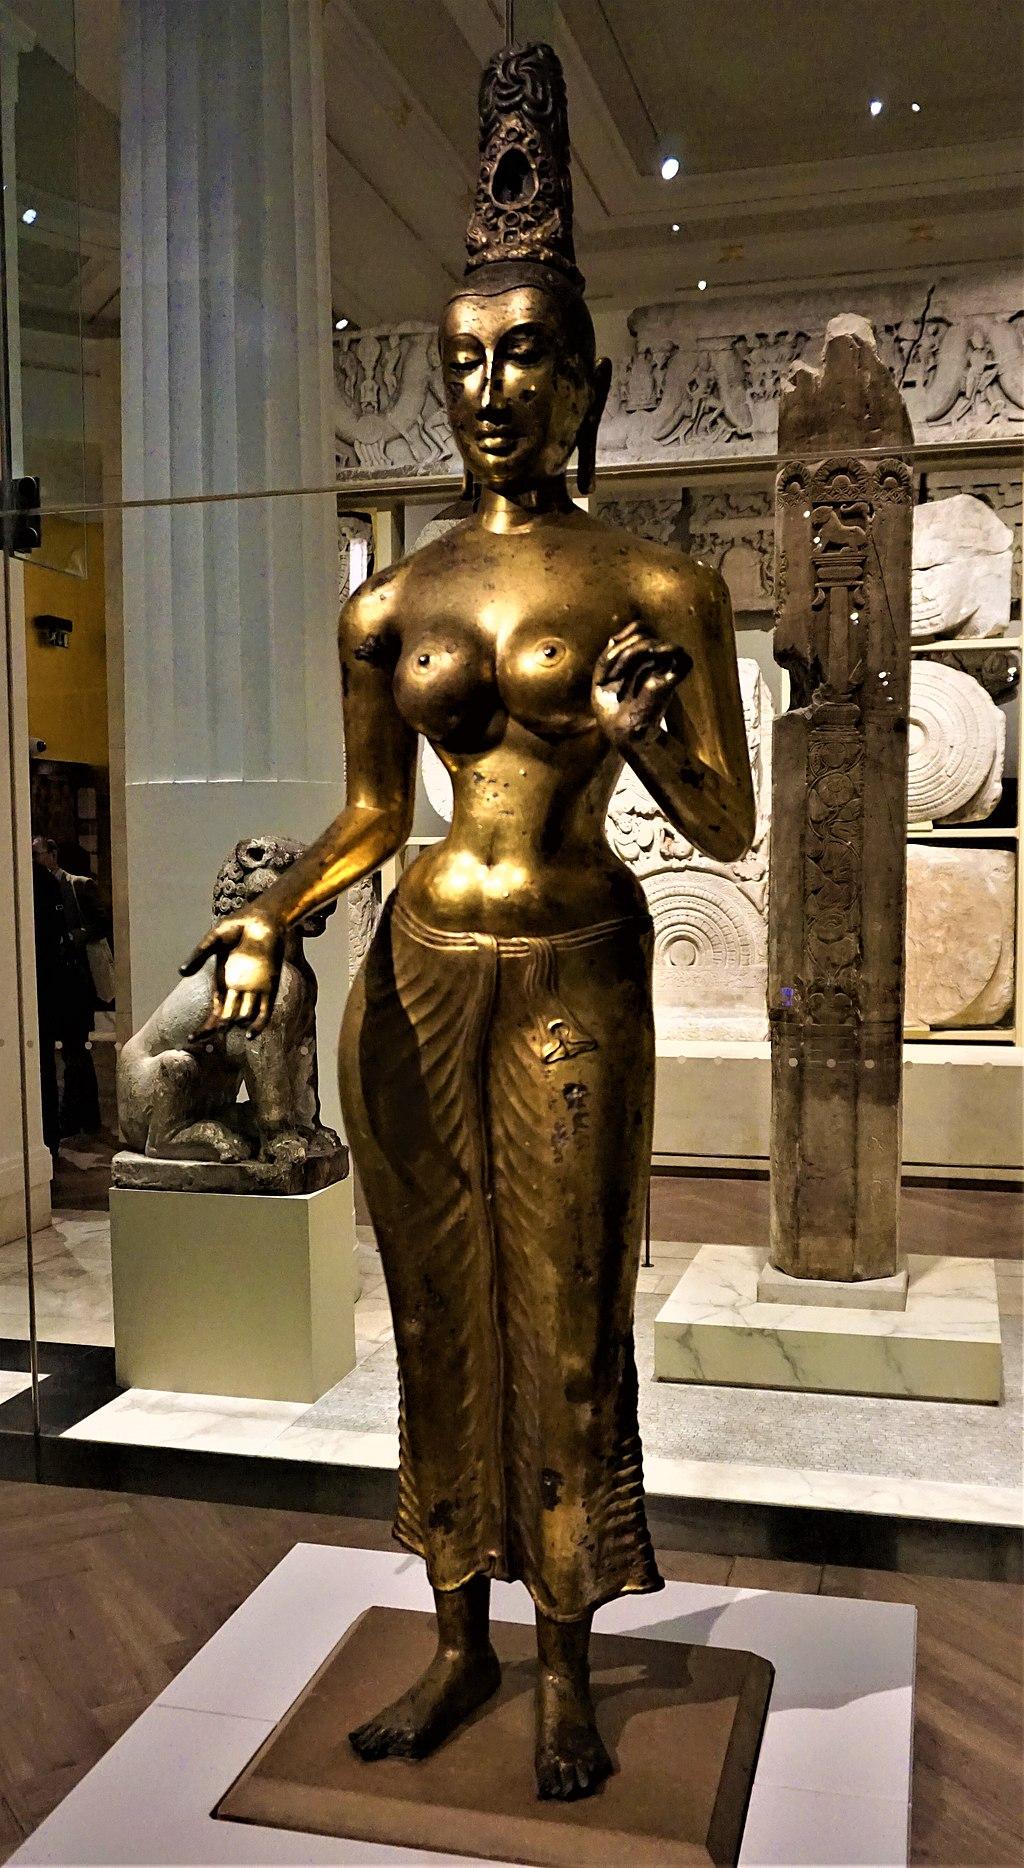 Statue of Tara - British Museum - Joy of Museums